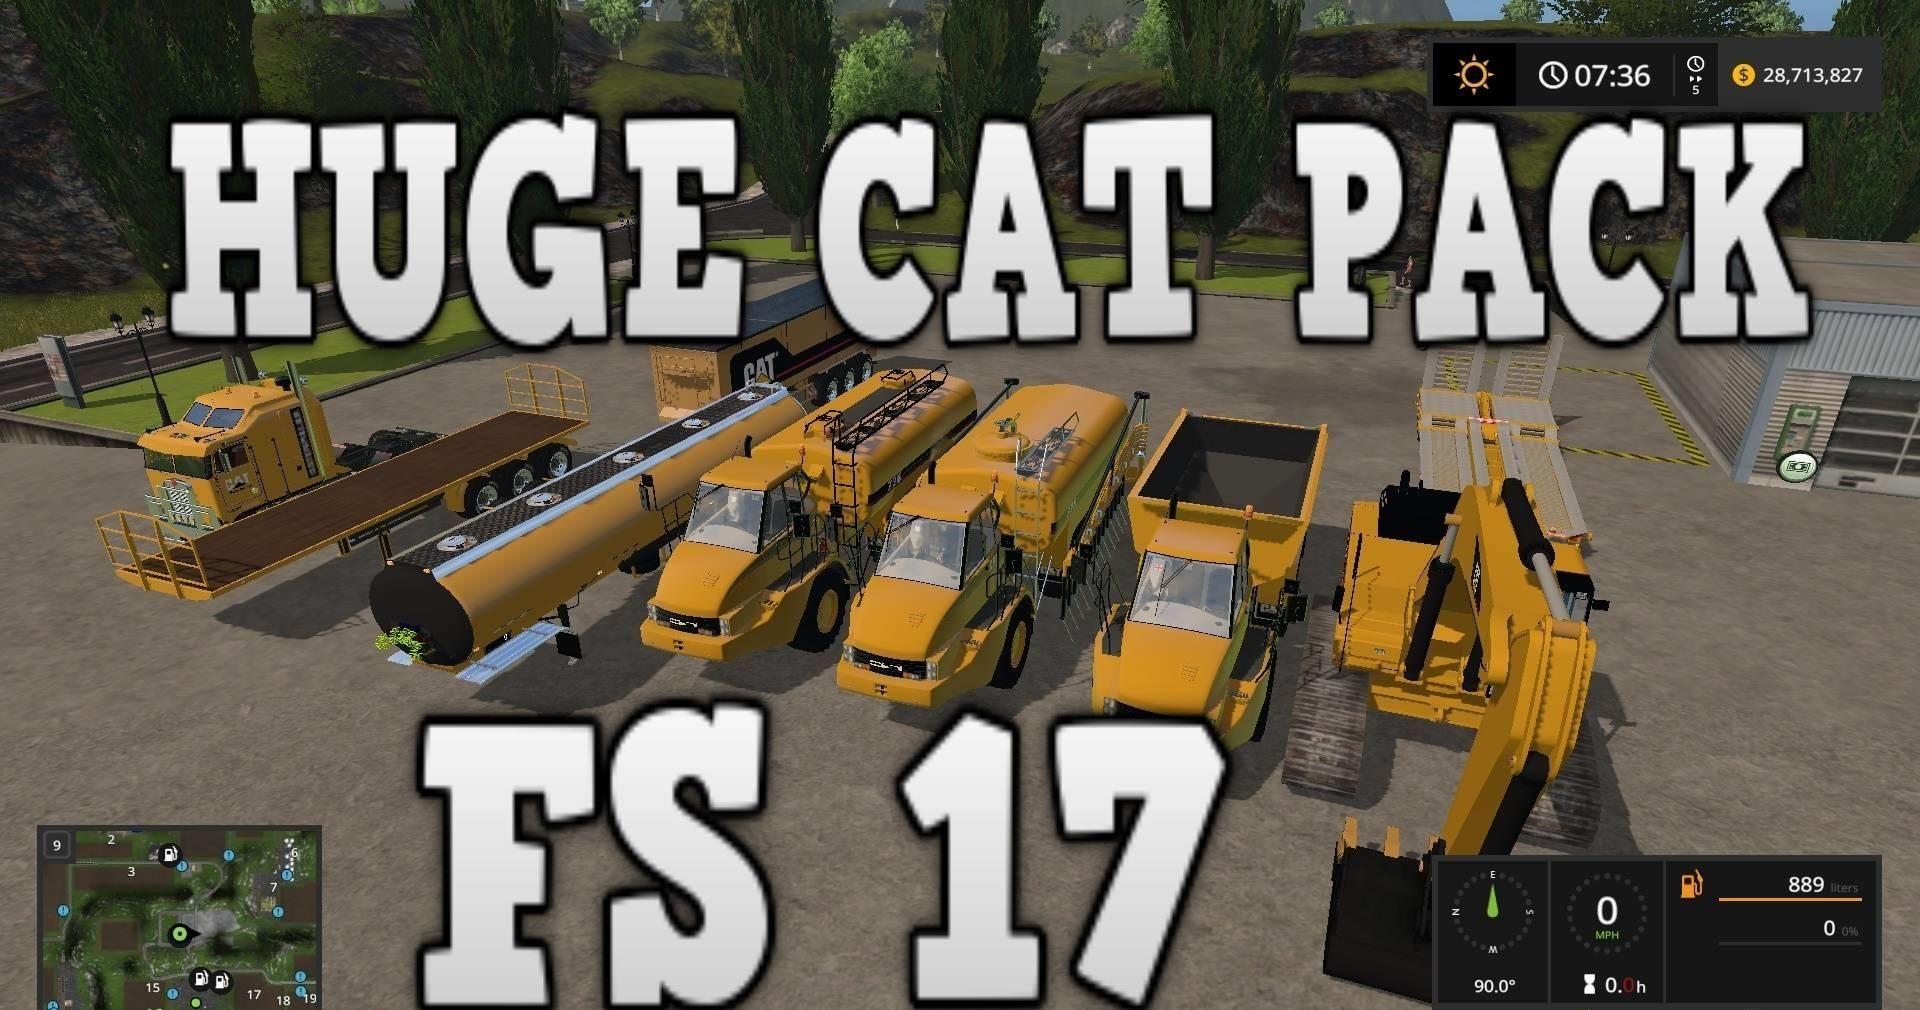 HUGE CAT PACK V2 0 FS17 - Farming Simulator 17 mod / FS 2017